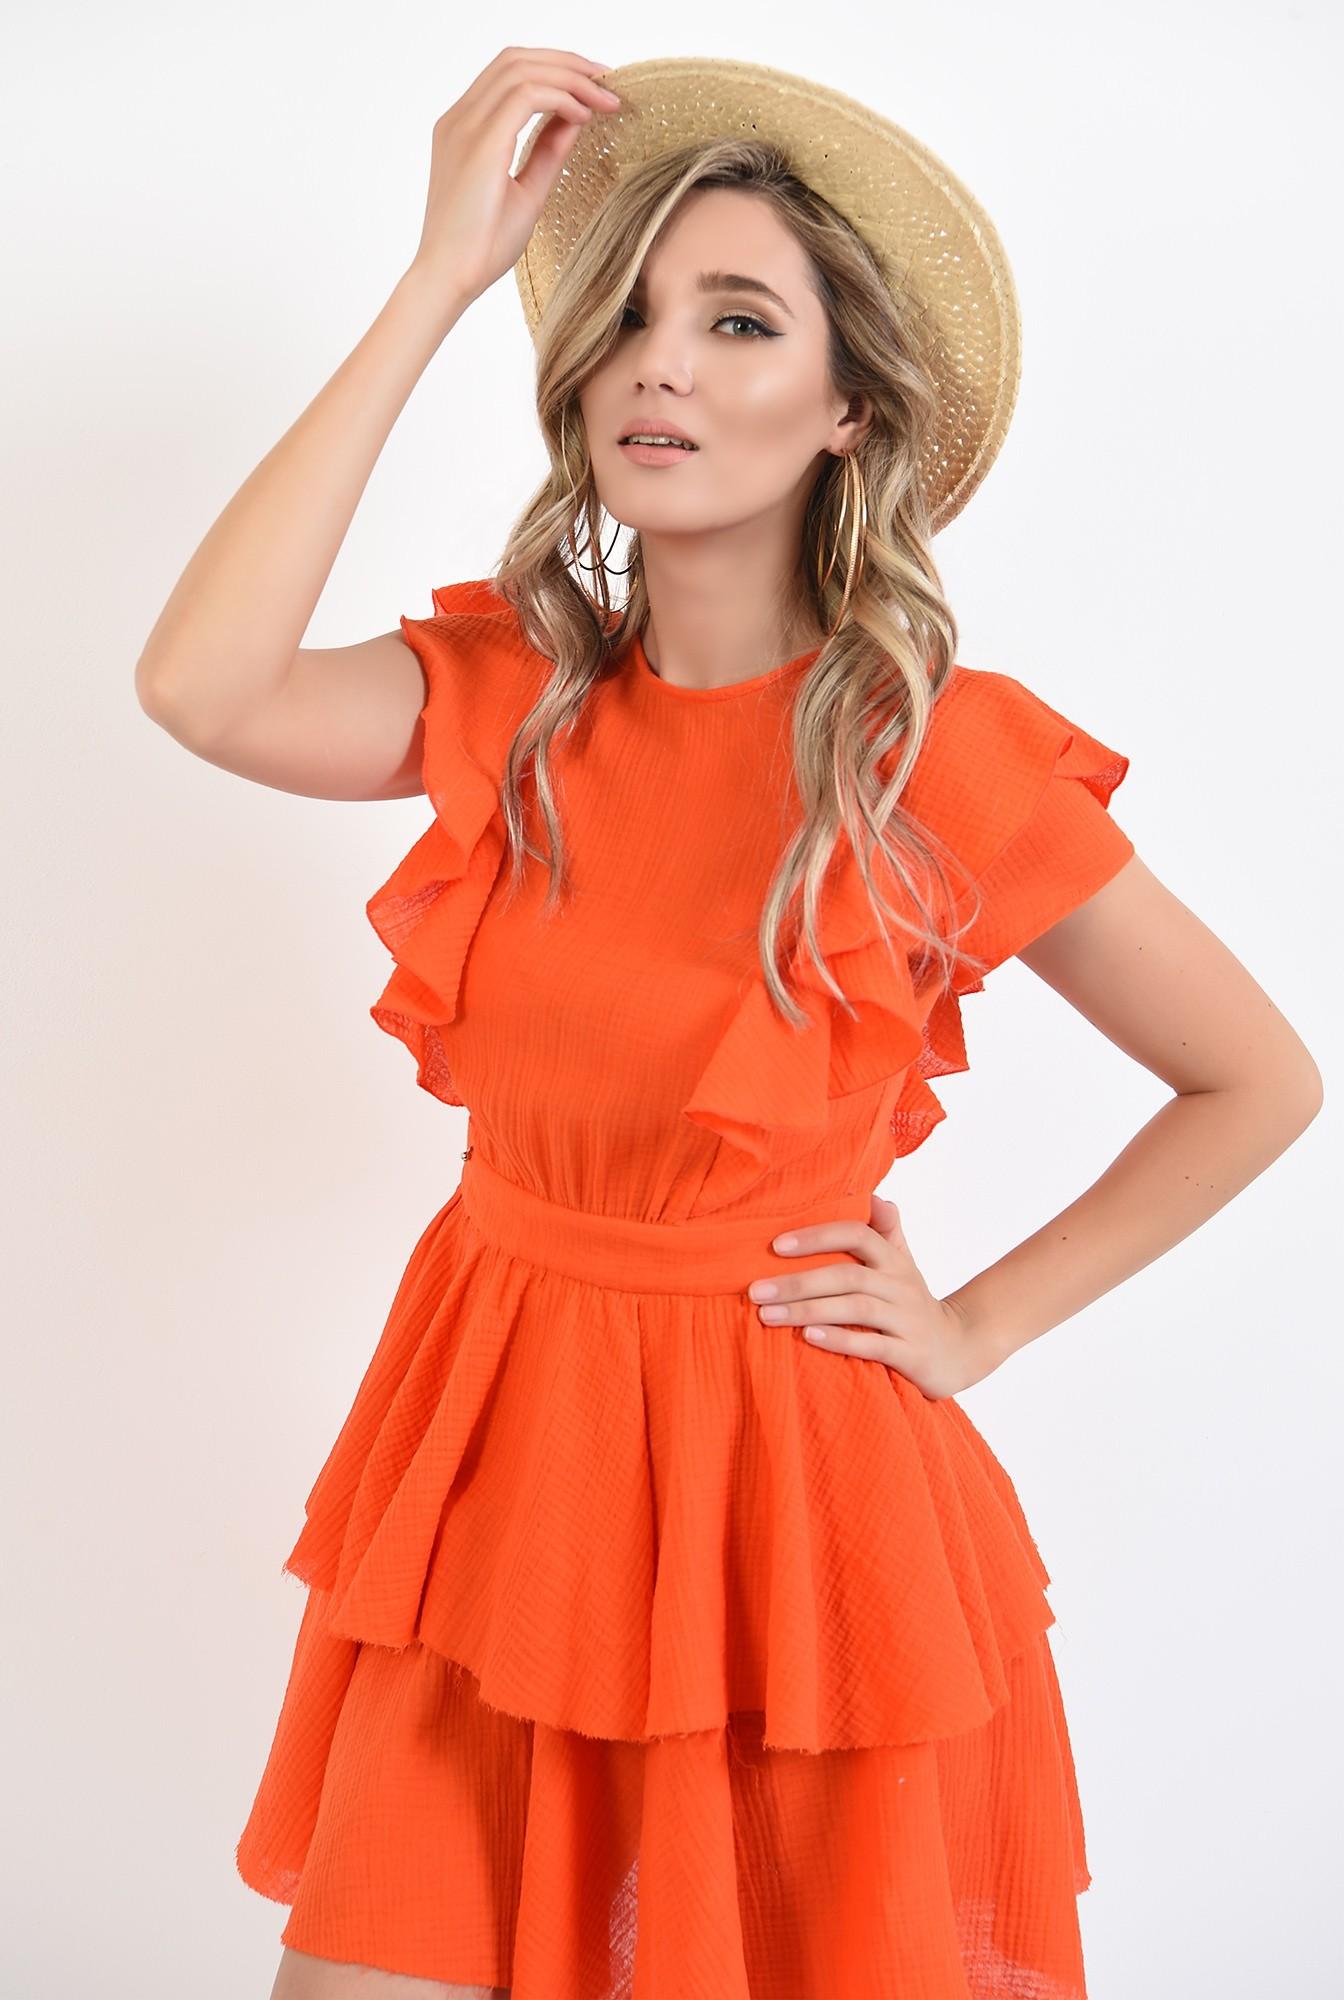 0 - 360 - rochie mini, orange, cu volane, Poema